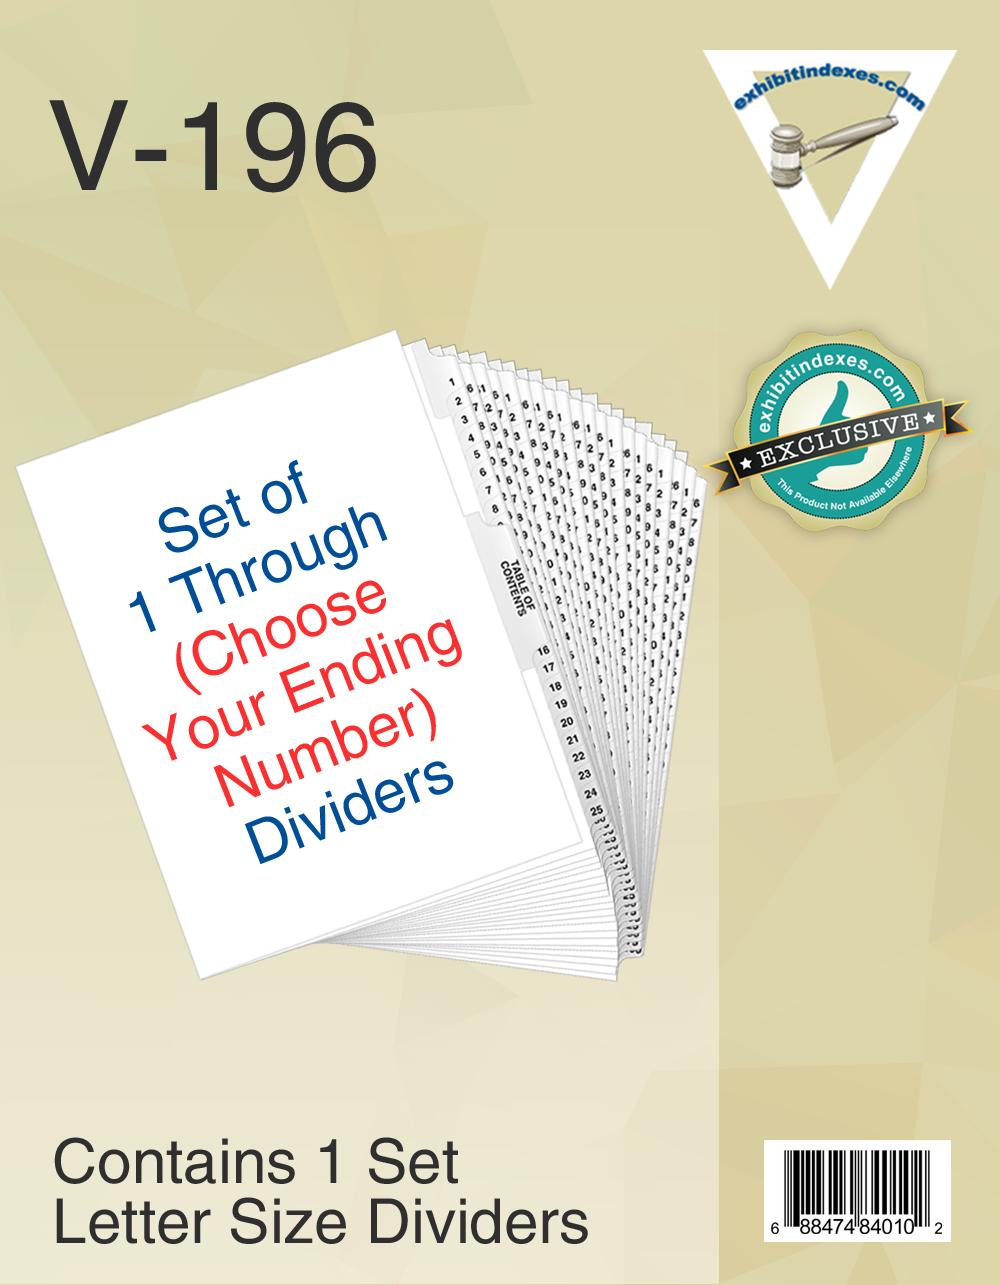 v-196-copy.png